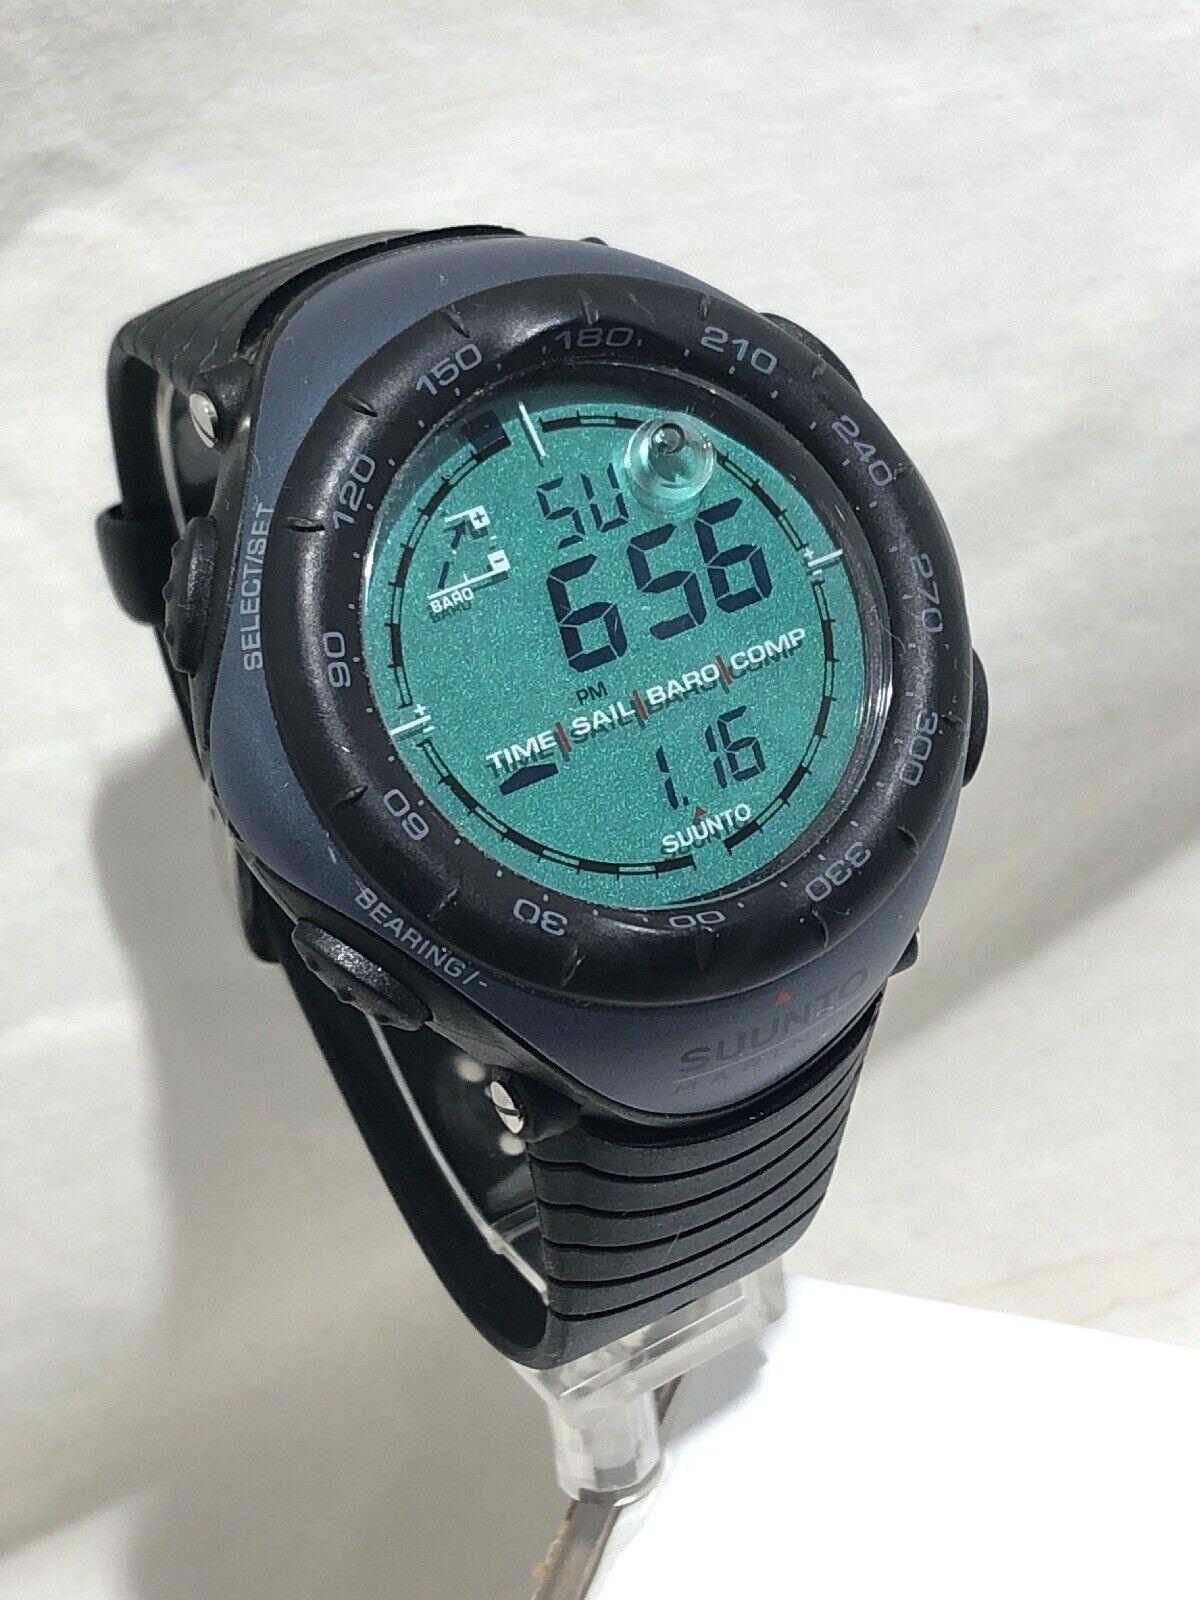 SUUNTO Marine Sailing Compass Barometer Watch Excellent